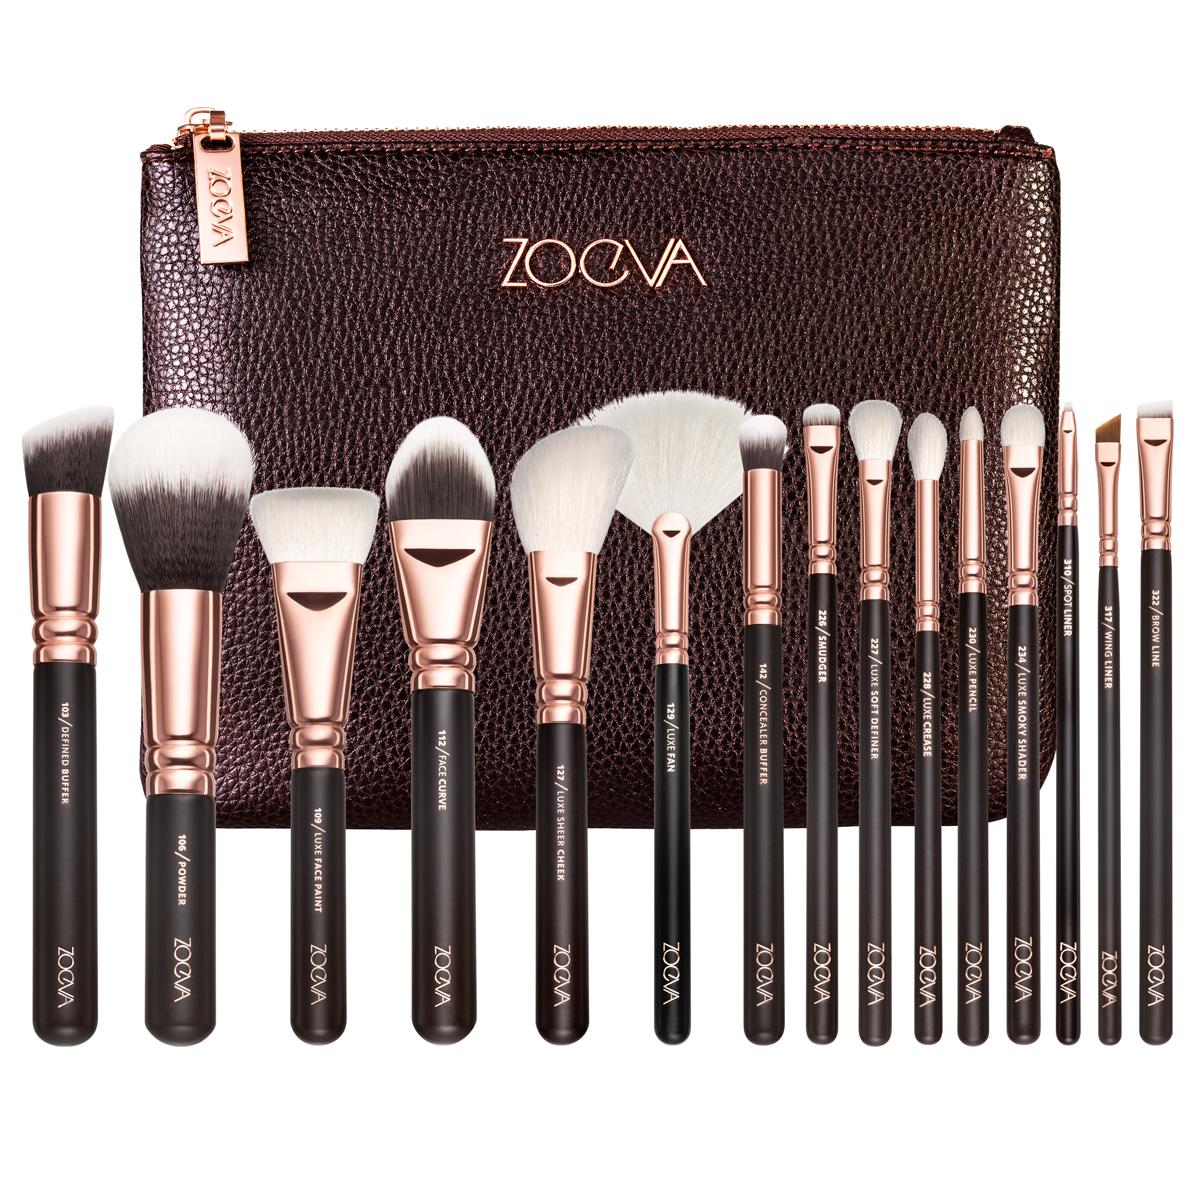 Zoeva 化妆刷套装8支